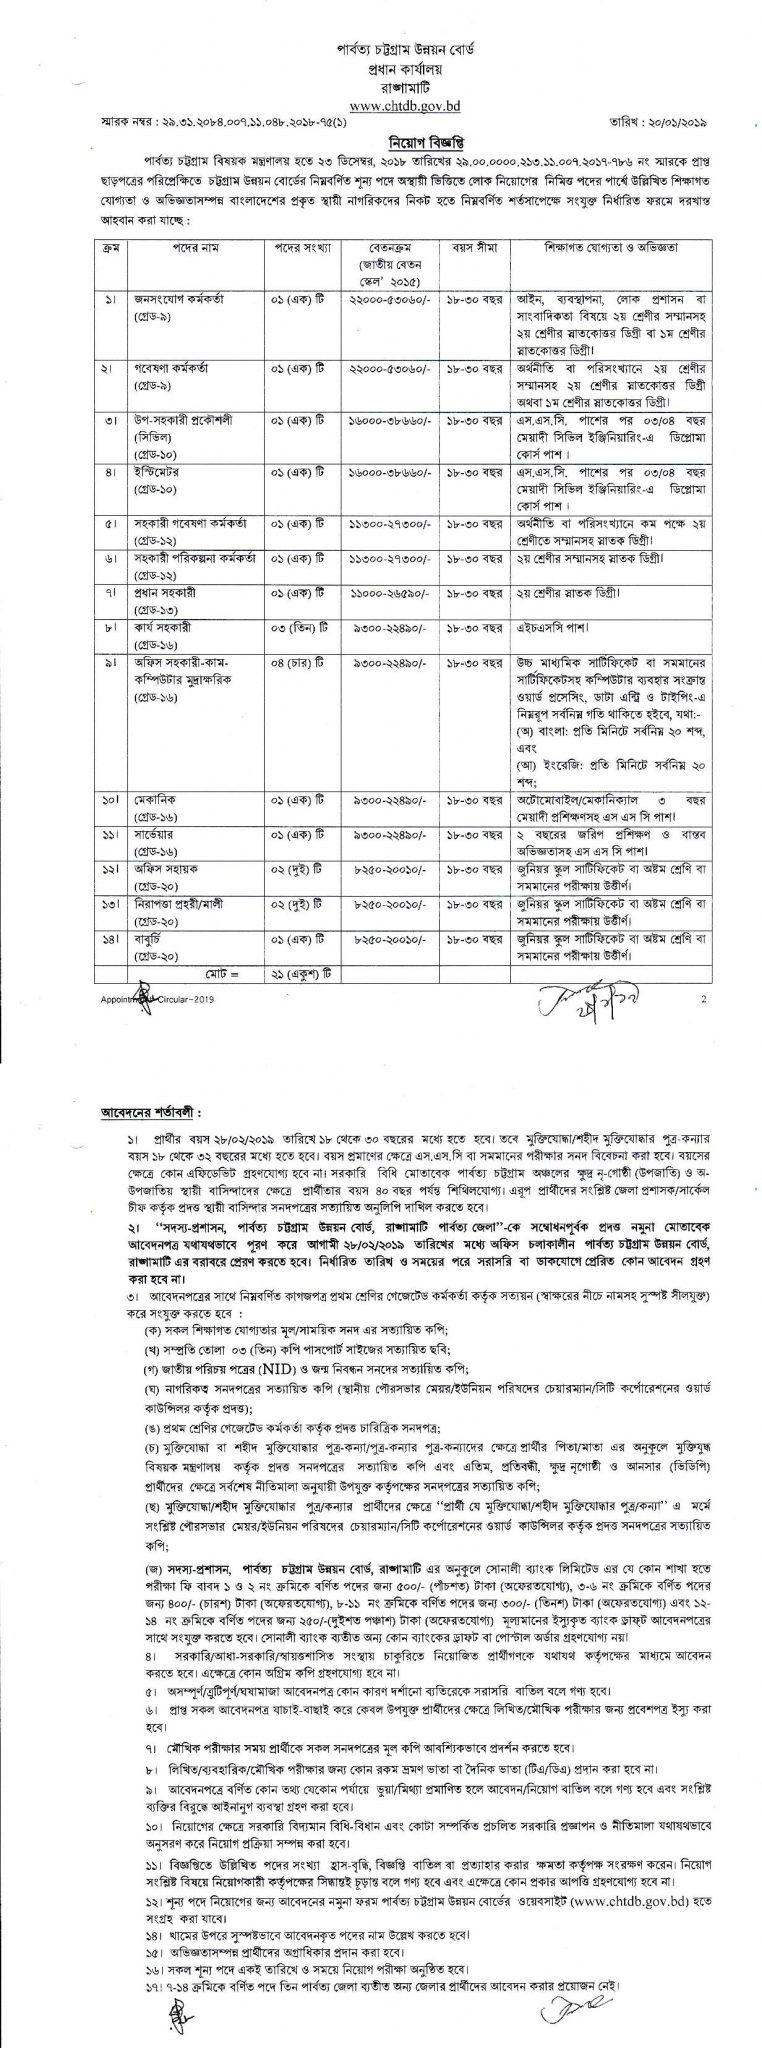 Chittagong Hill Tracts Development Board Job Circular 2019